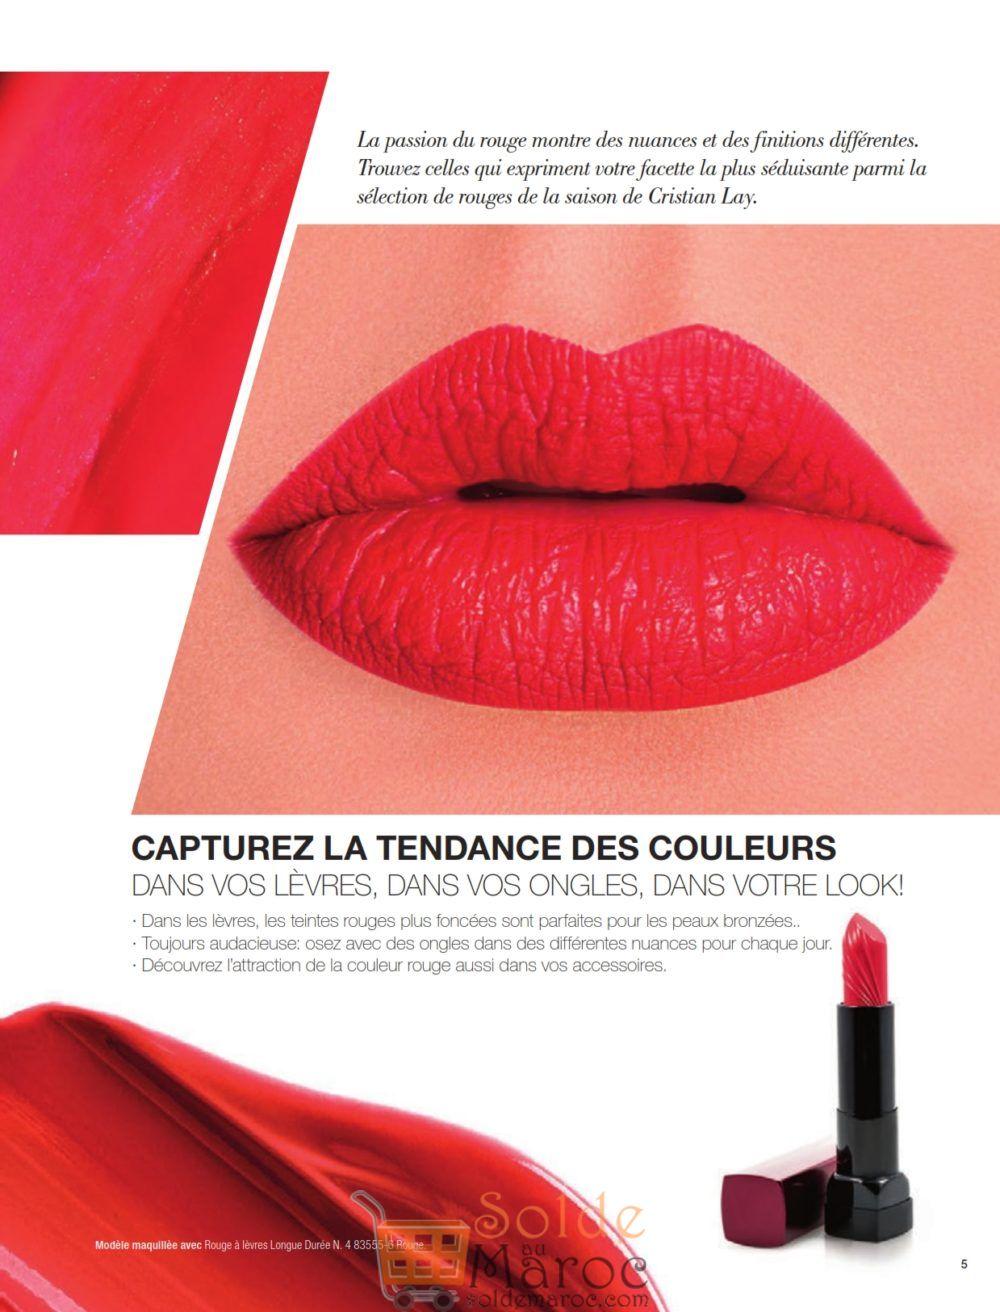 Catalogue CRISTIAN LAY Maroc General Book 2 du 23 AVRIL 24 AOÛT 2018